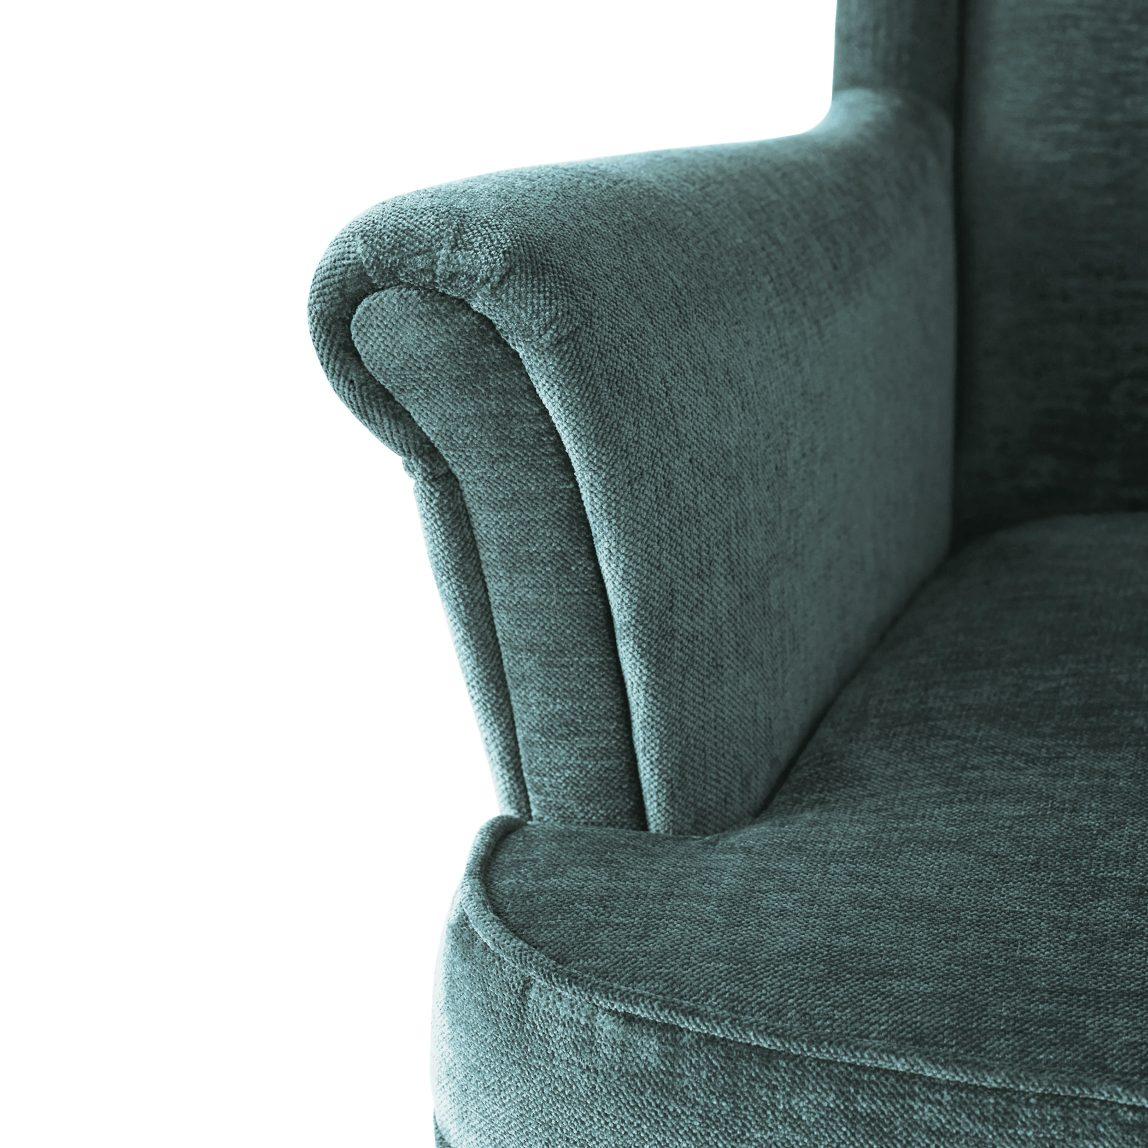 Кресло ikea Страндмон зеленое